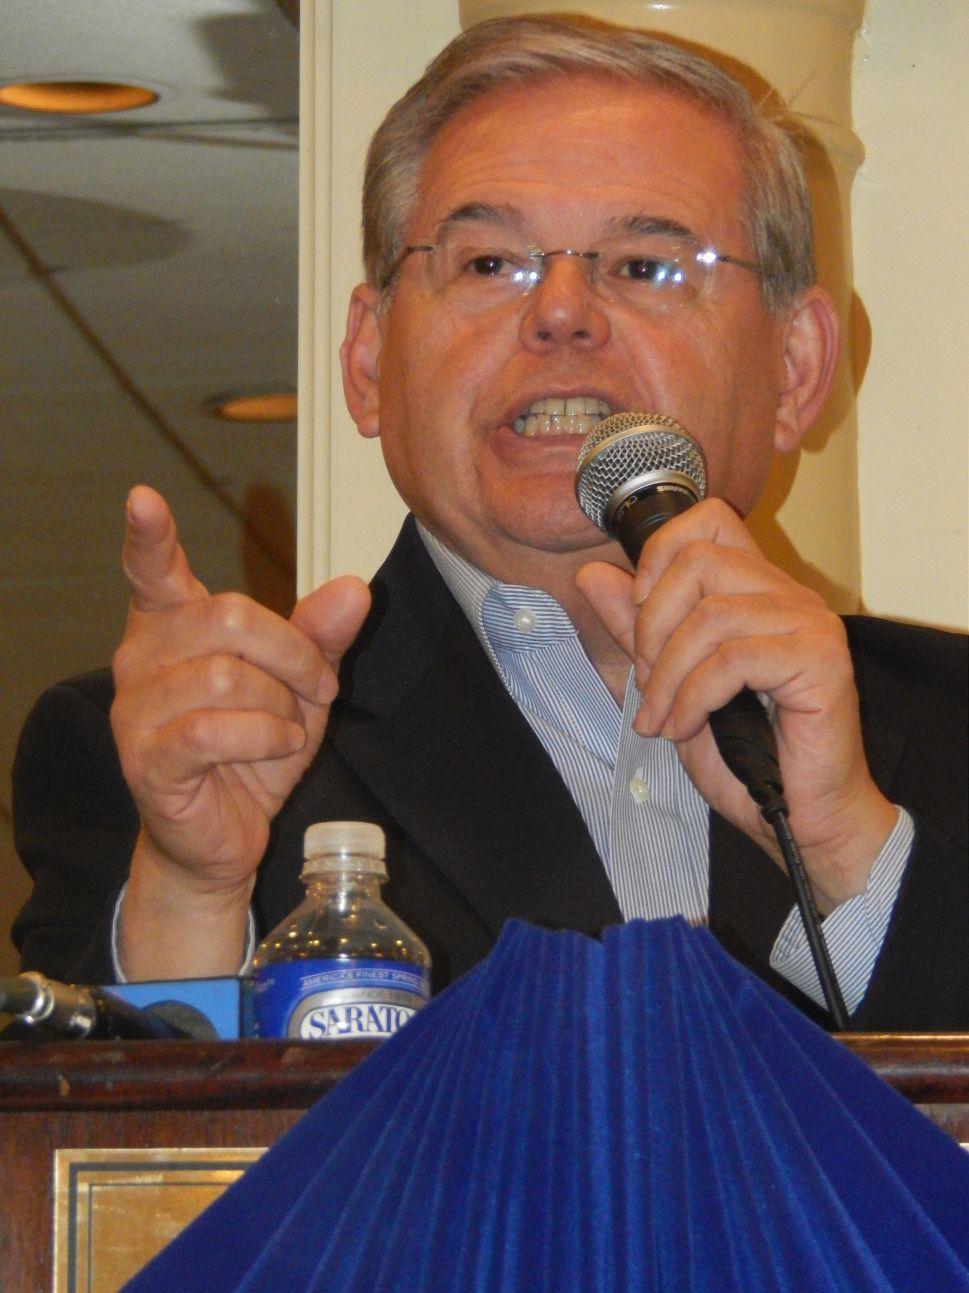 U.S. senators urge Obama admin to assist N.J. with receiving 'critical' supply of road salt